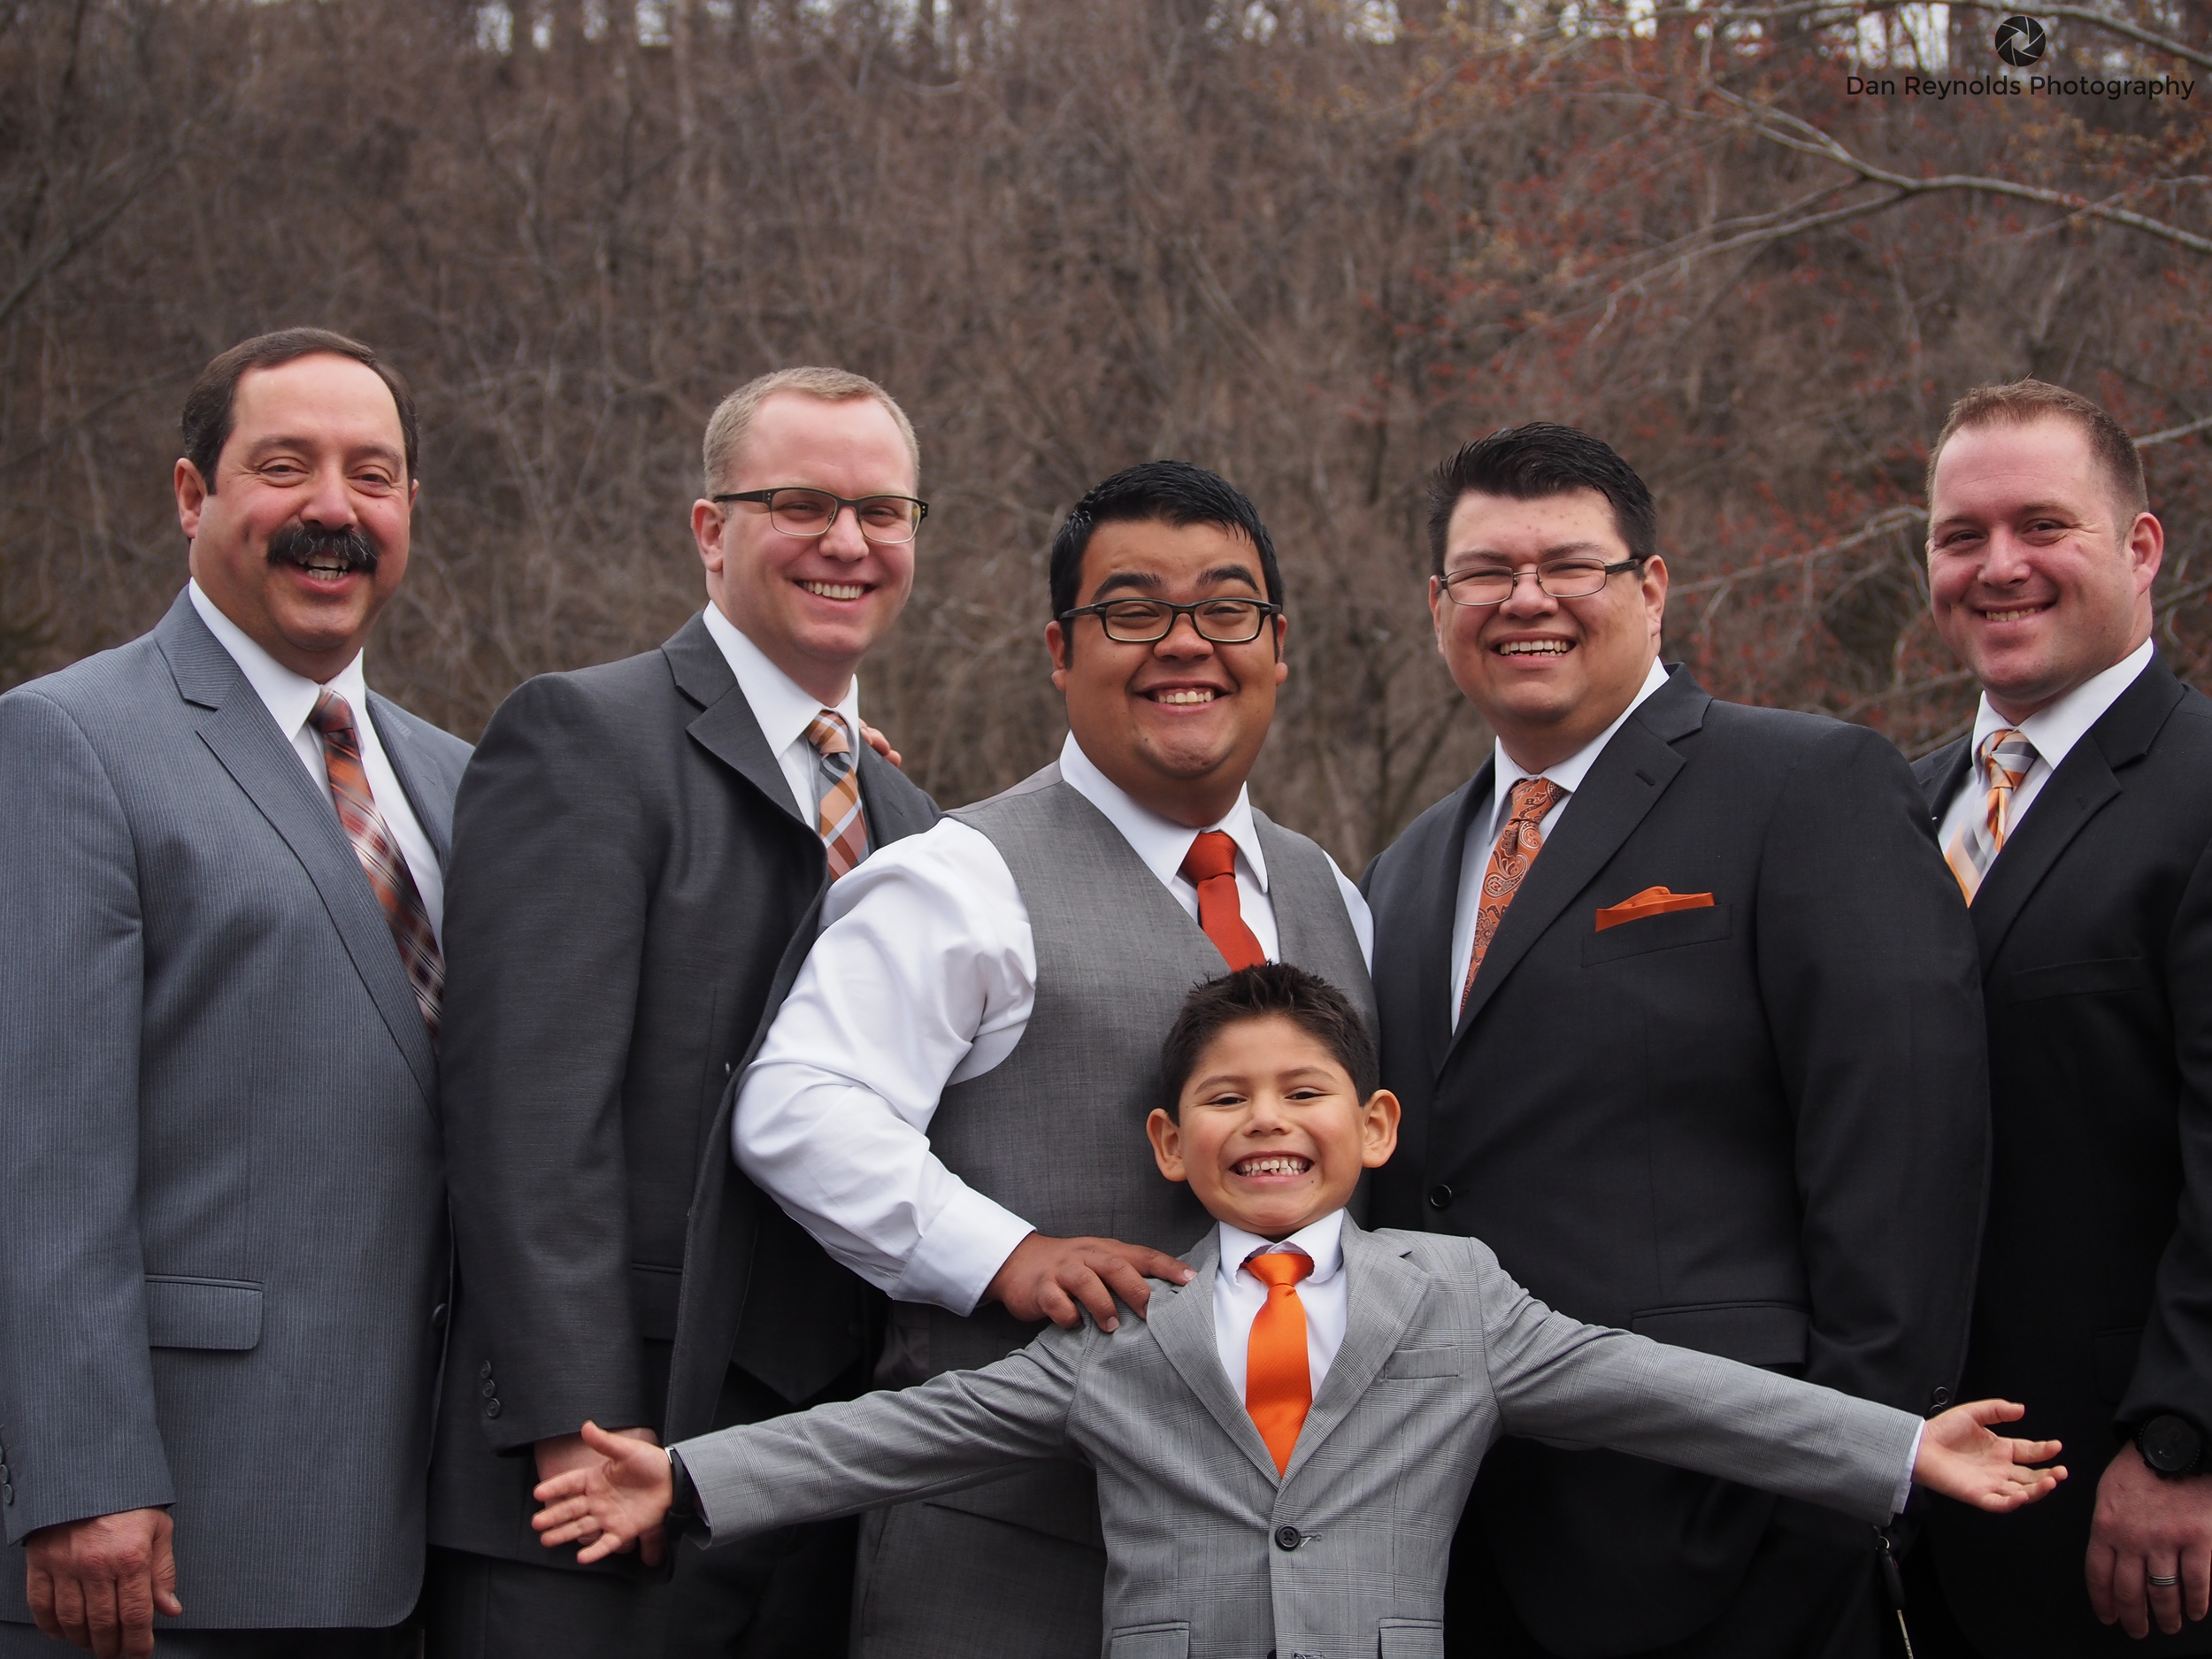 Rodriguez Wedding-2-2.jpg